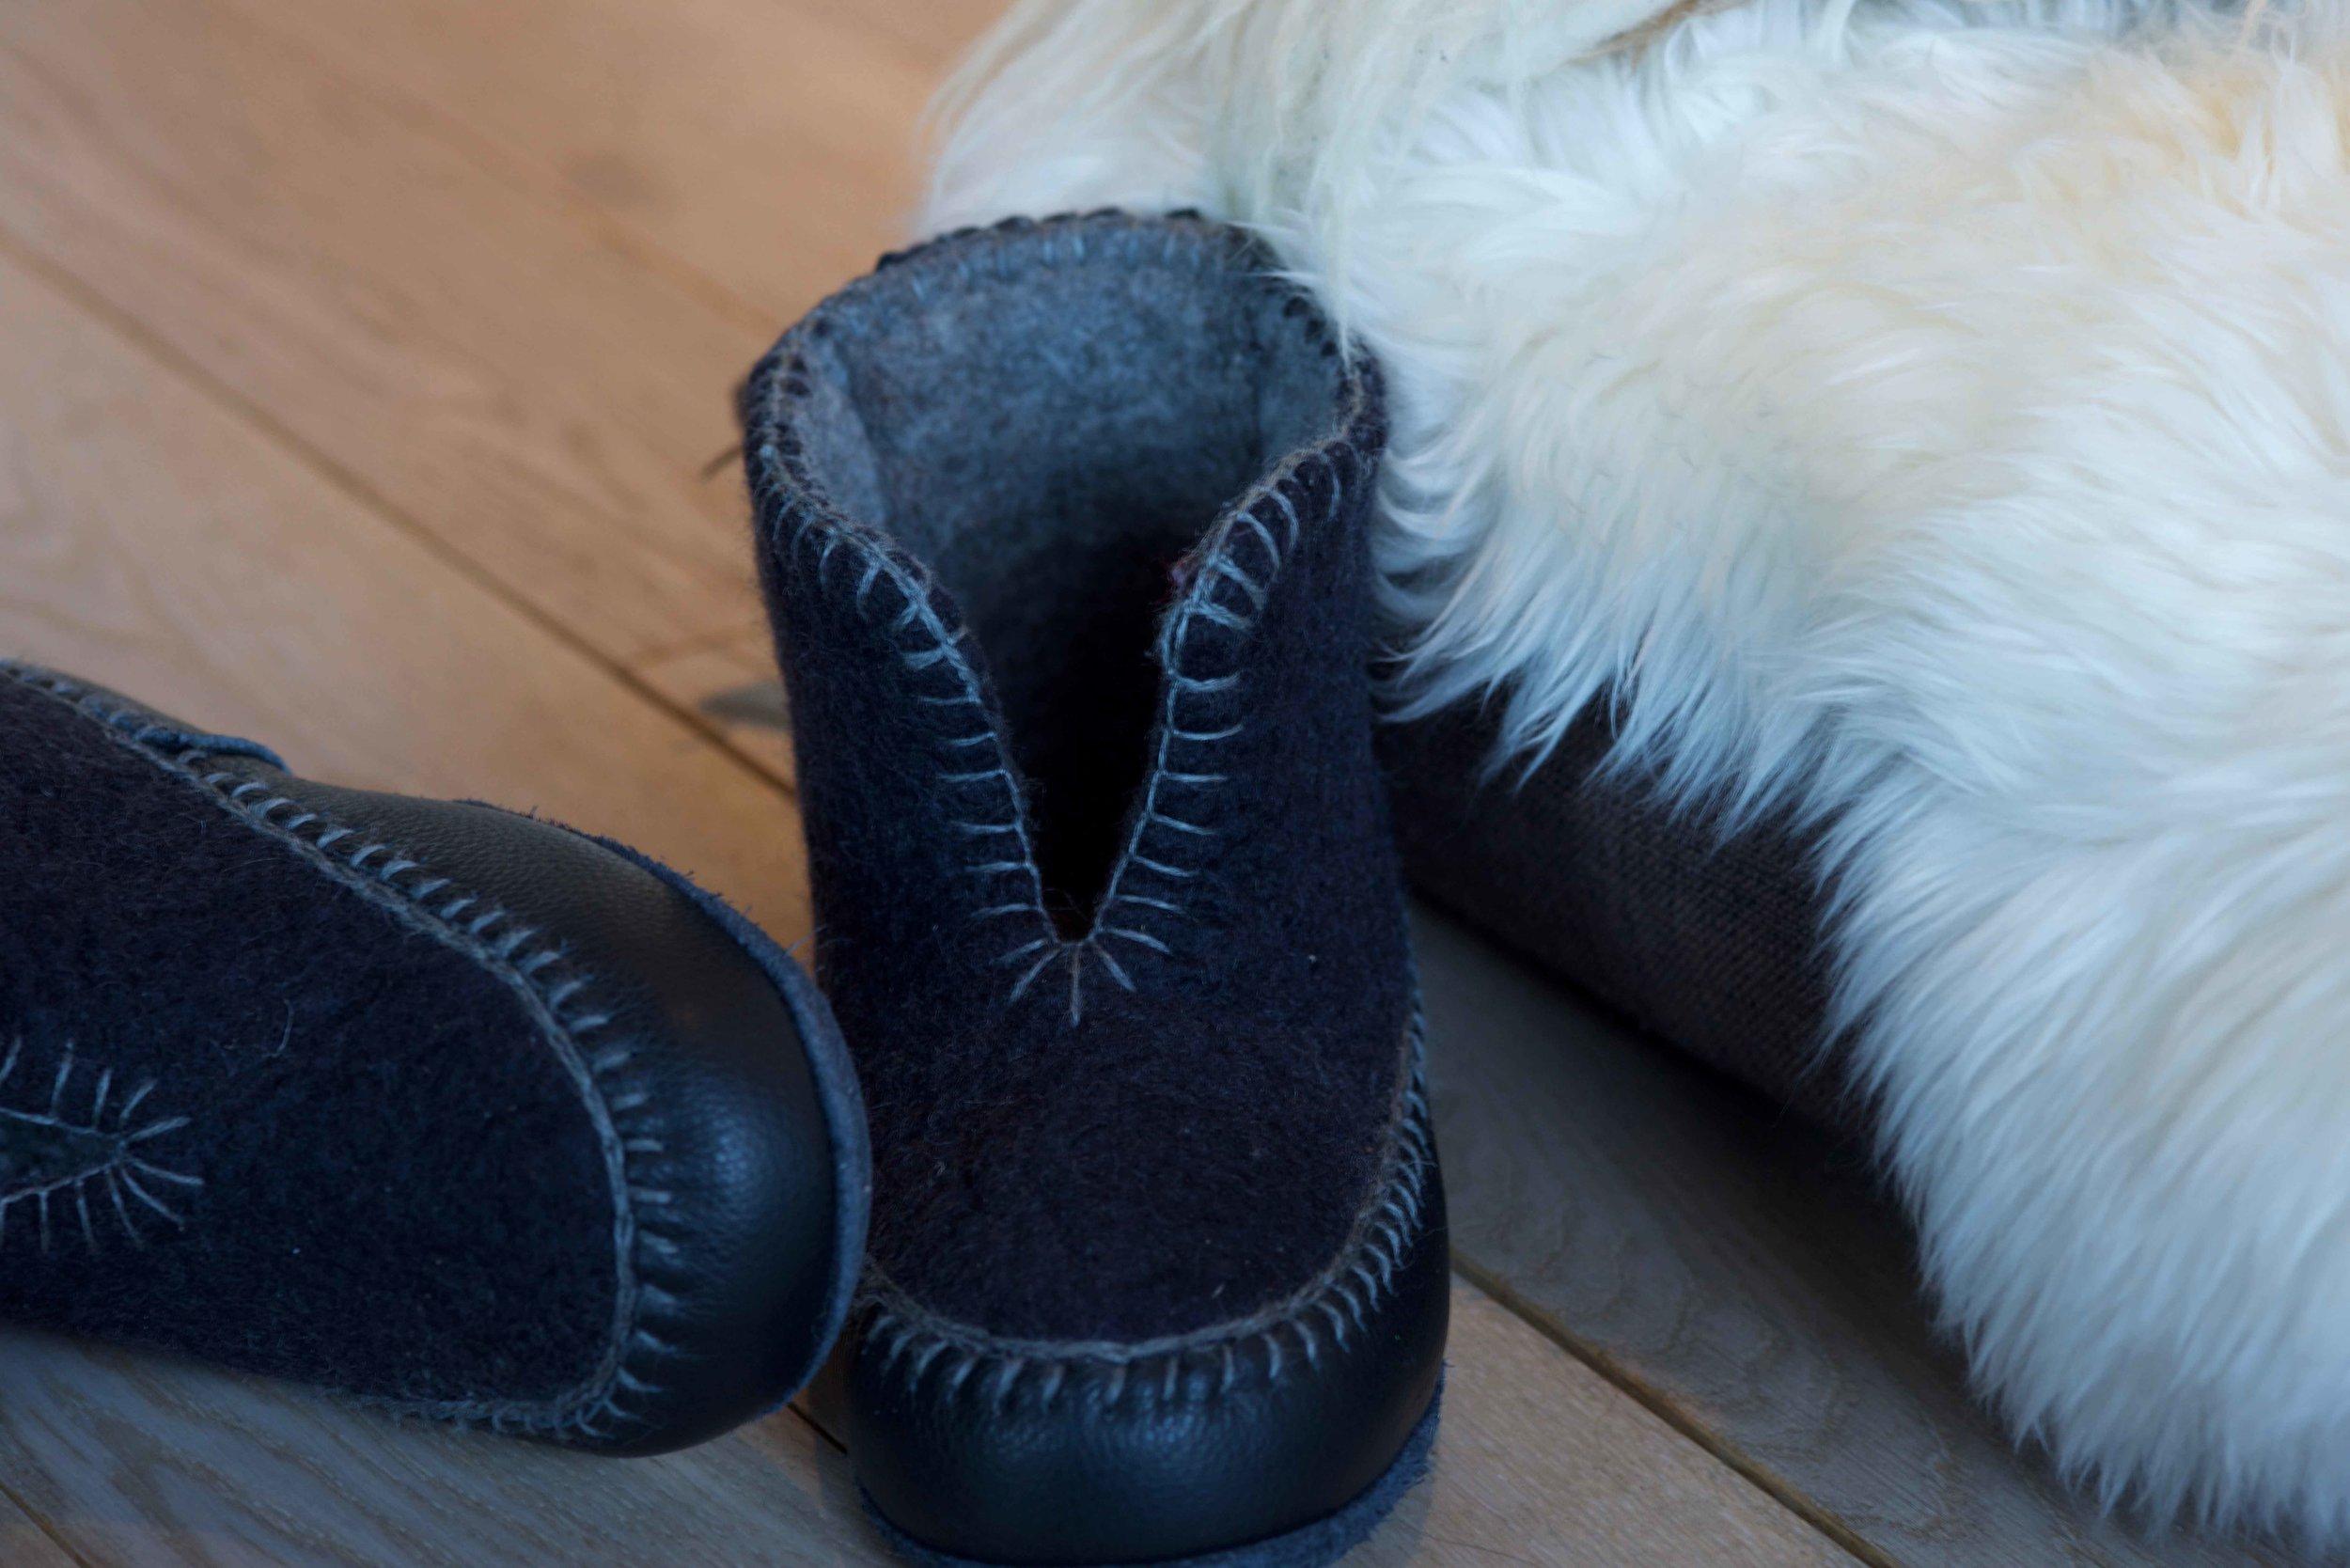 Warm house slippers,Lyngen Lodge, Arctic Circle, Norway. Image@thingstodot.com